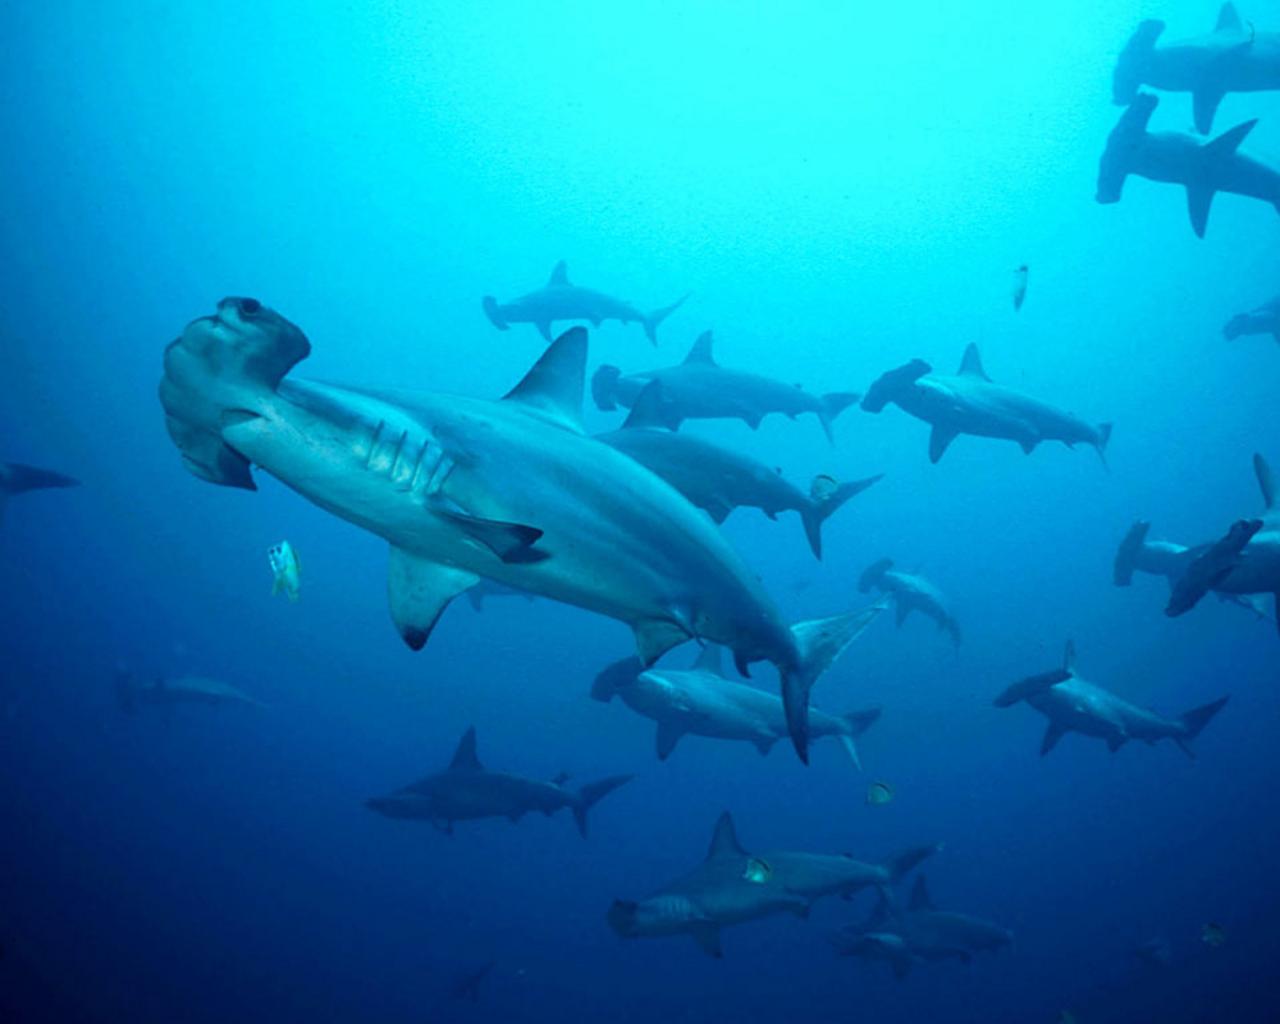 акула-молот, фото, обои на рабочий стол